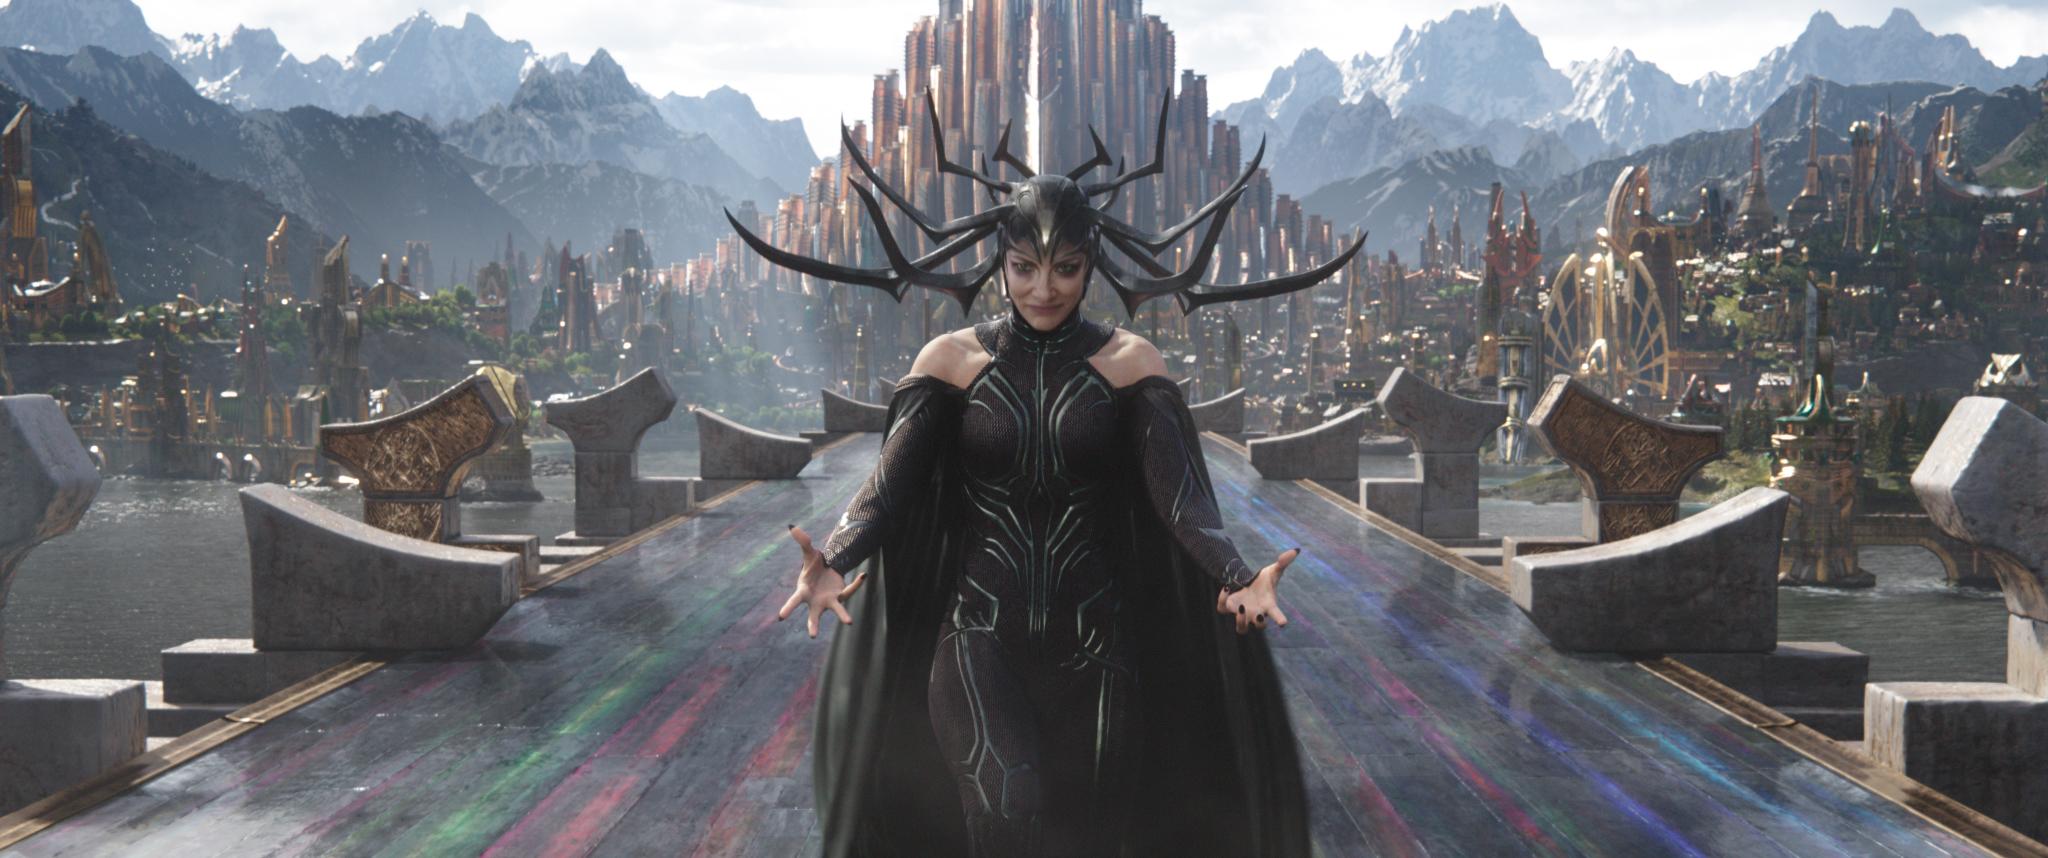 Thor-Ragnarok-Cate-Blanchett-as-Hela